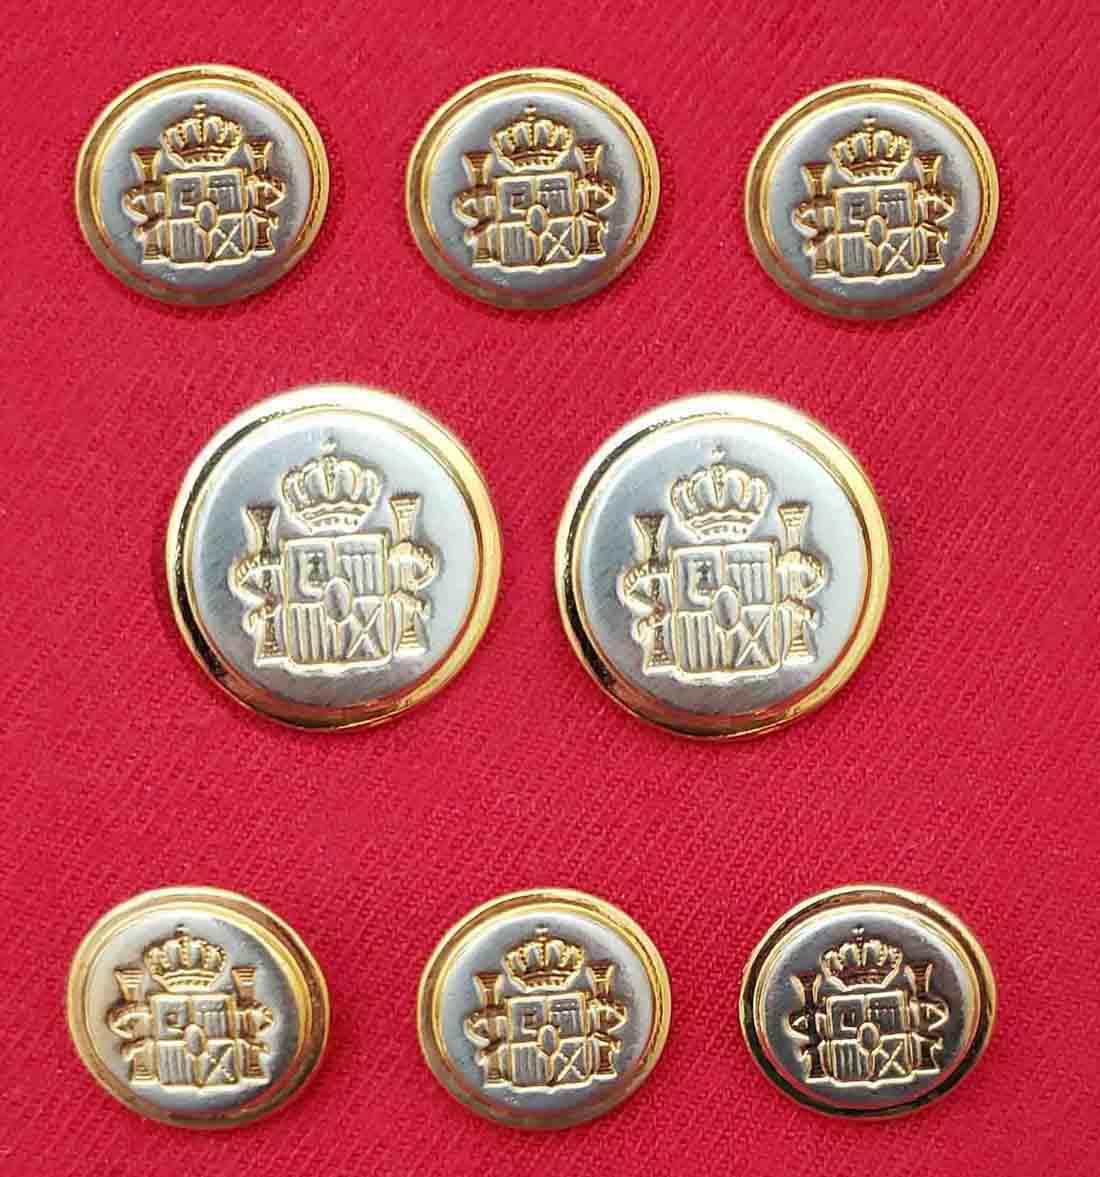 Vintage Mappelli De Milano Blazer Buttons Set Silver Gold Shank Men's